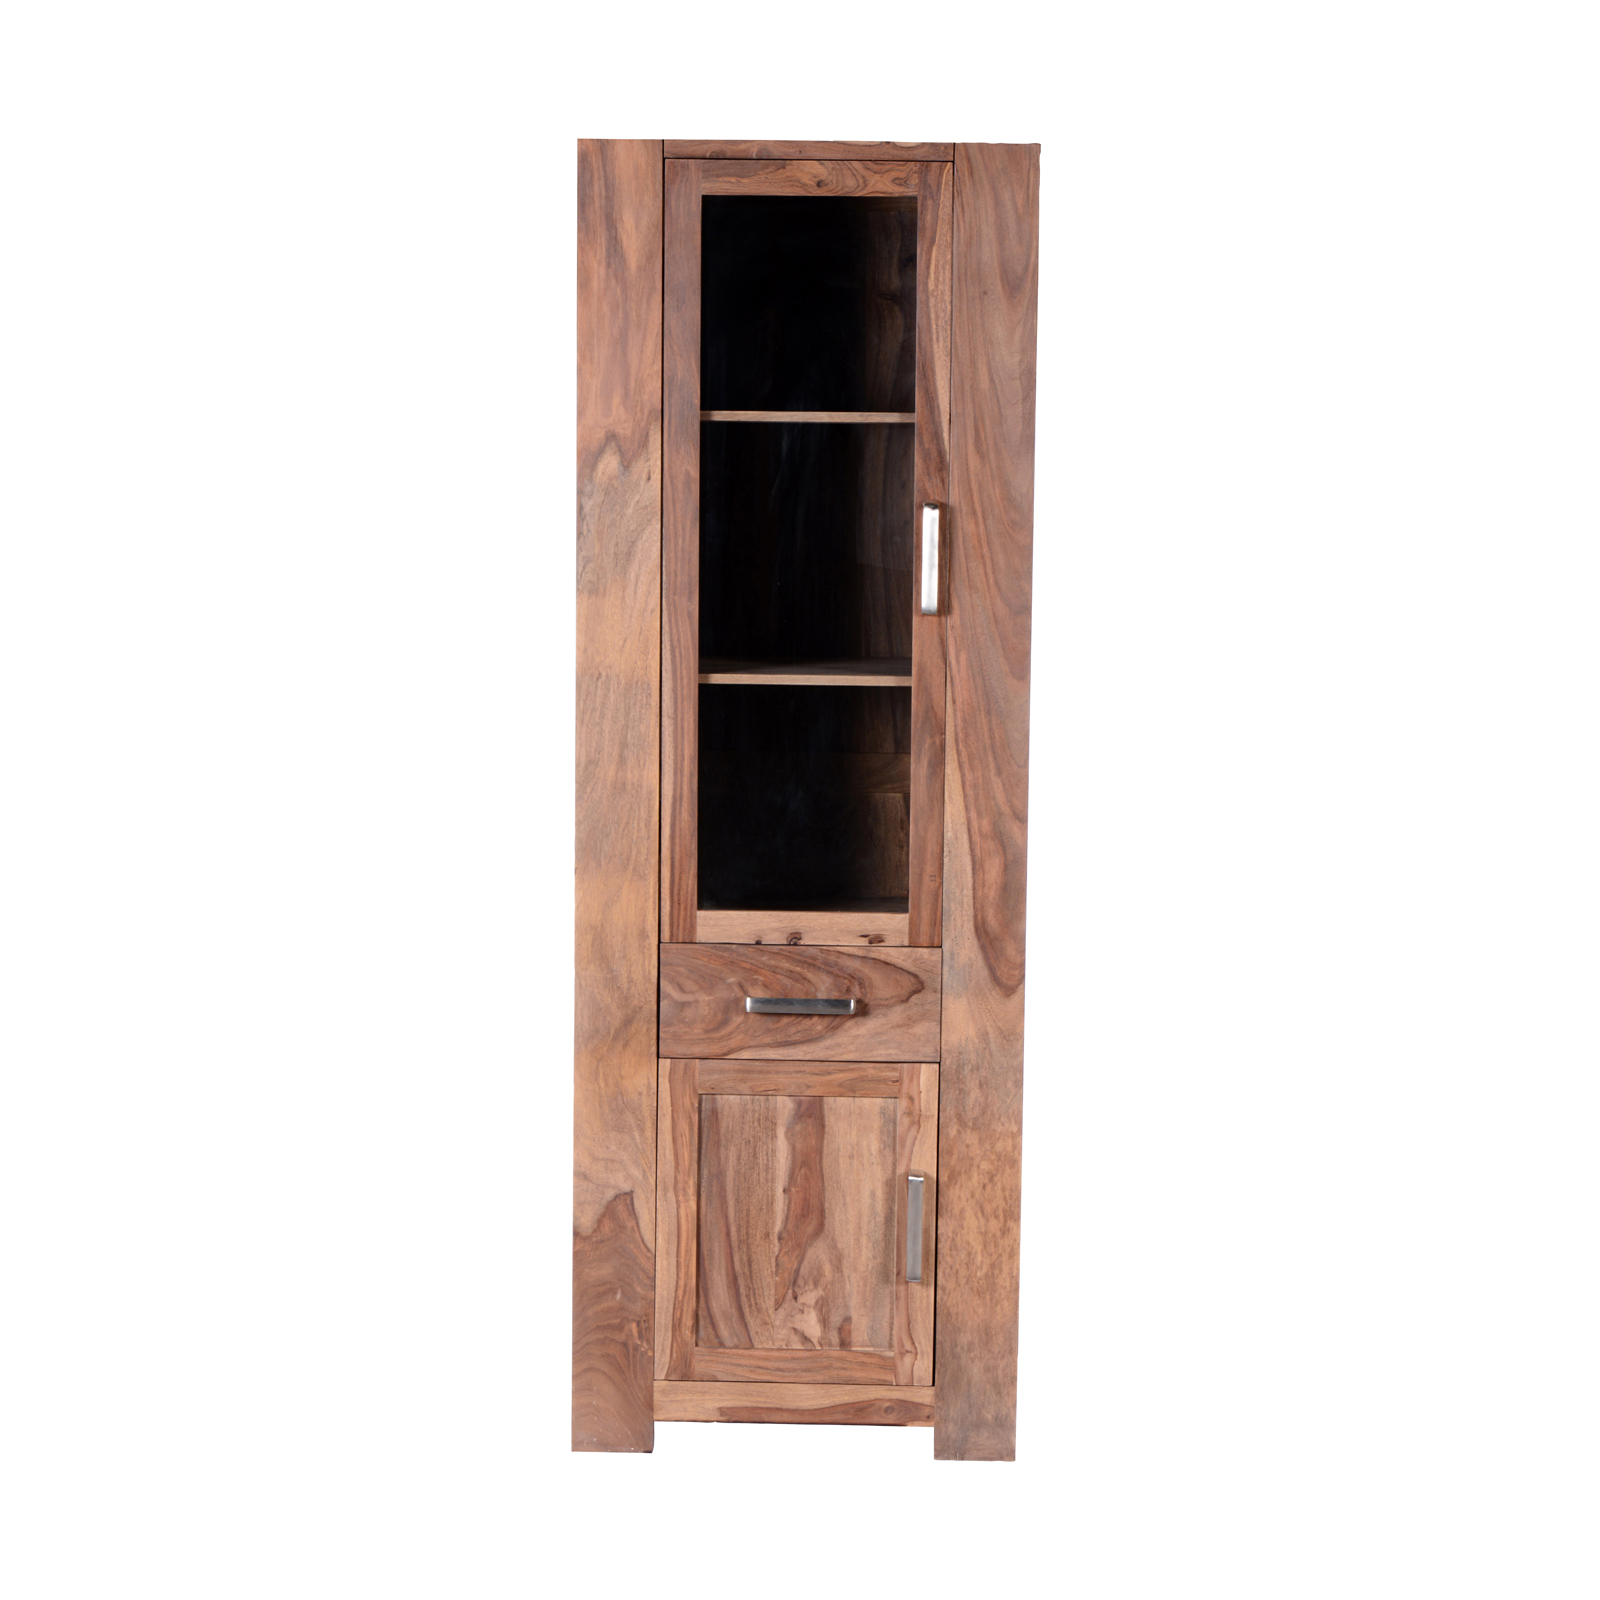 vitrine thor mit linksanschlag wohnzimmer aus massivem sheesham holz ebay. Black Bedroom Furniture Sets. Home Design Ideas